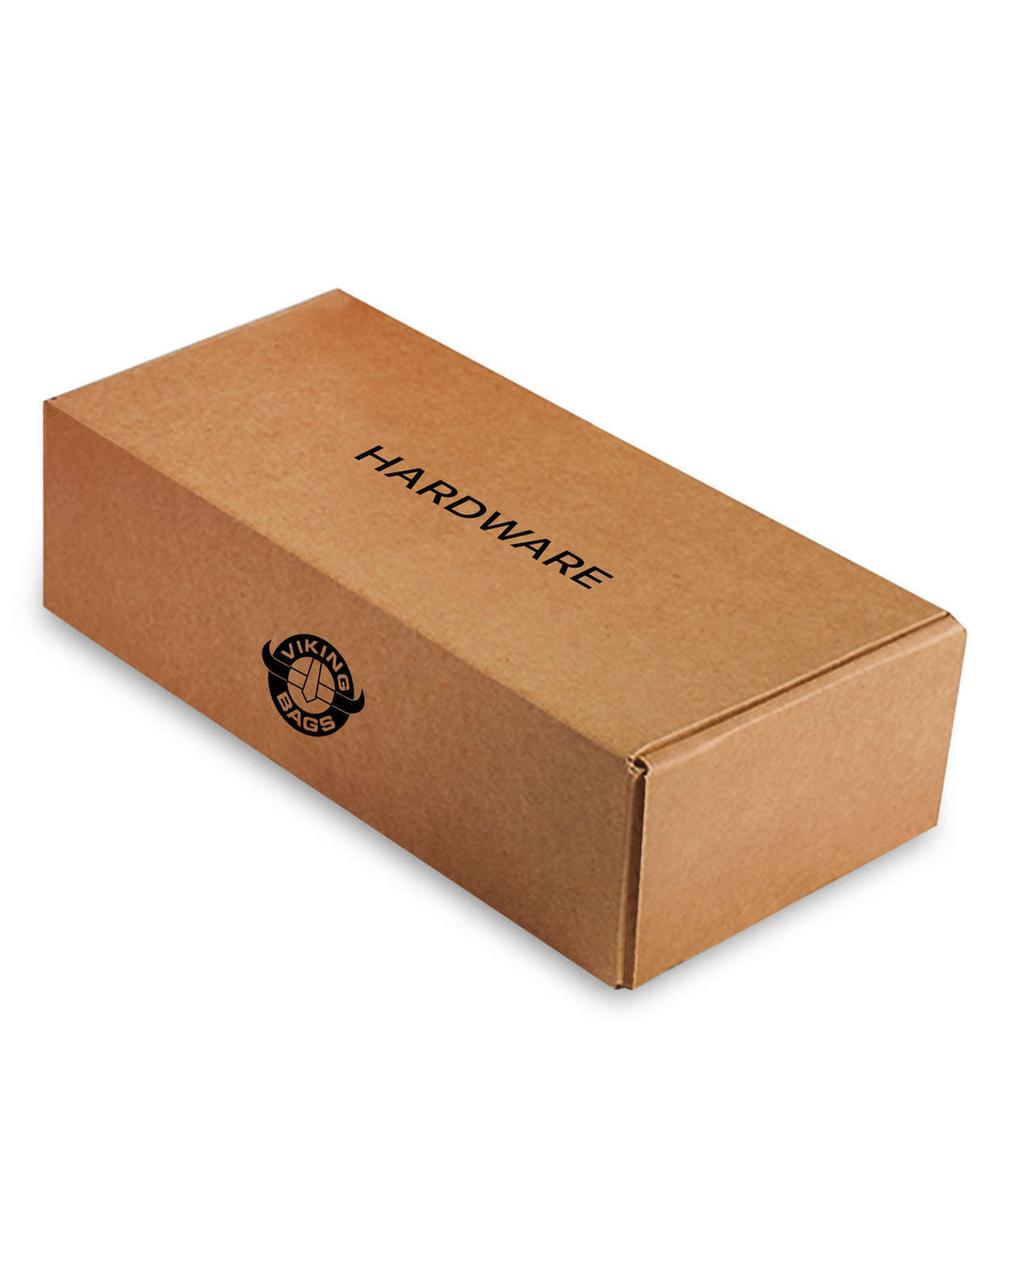 Triumph Rocket III Range Medium Slanted Motorcycle Saddlebags Box